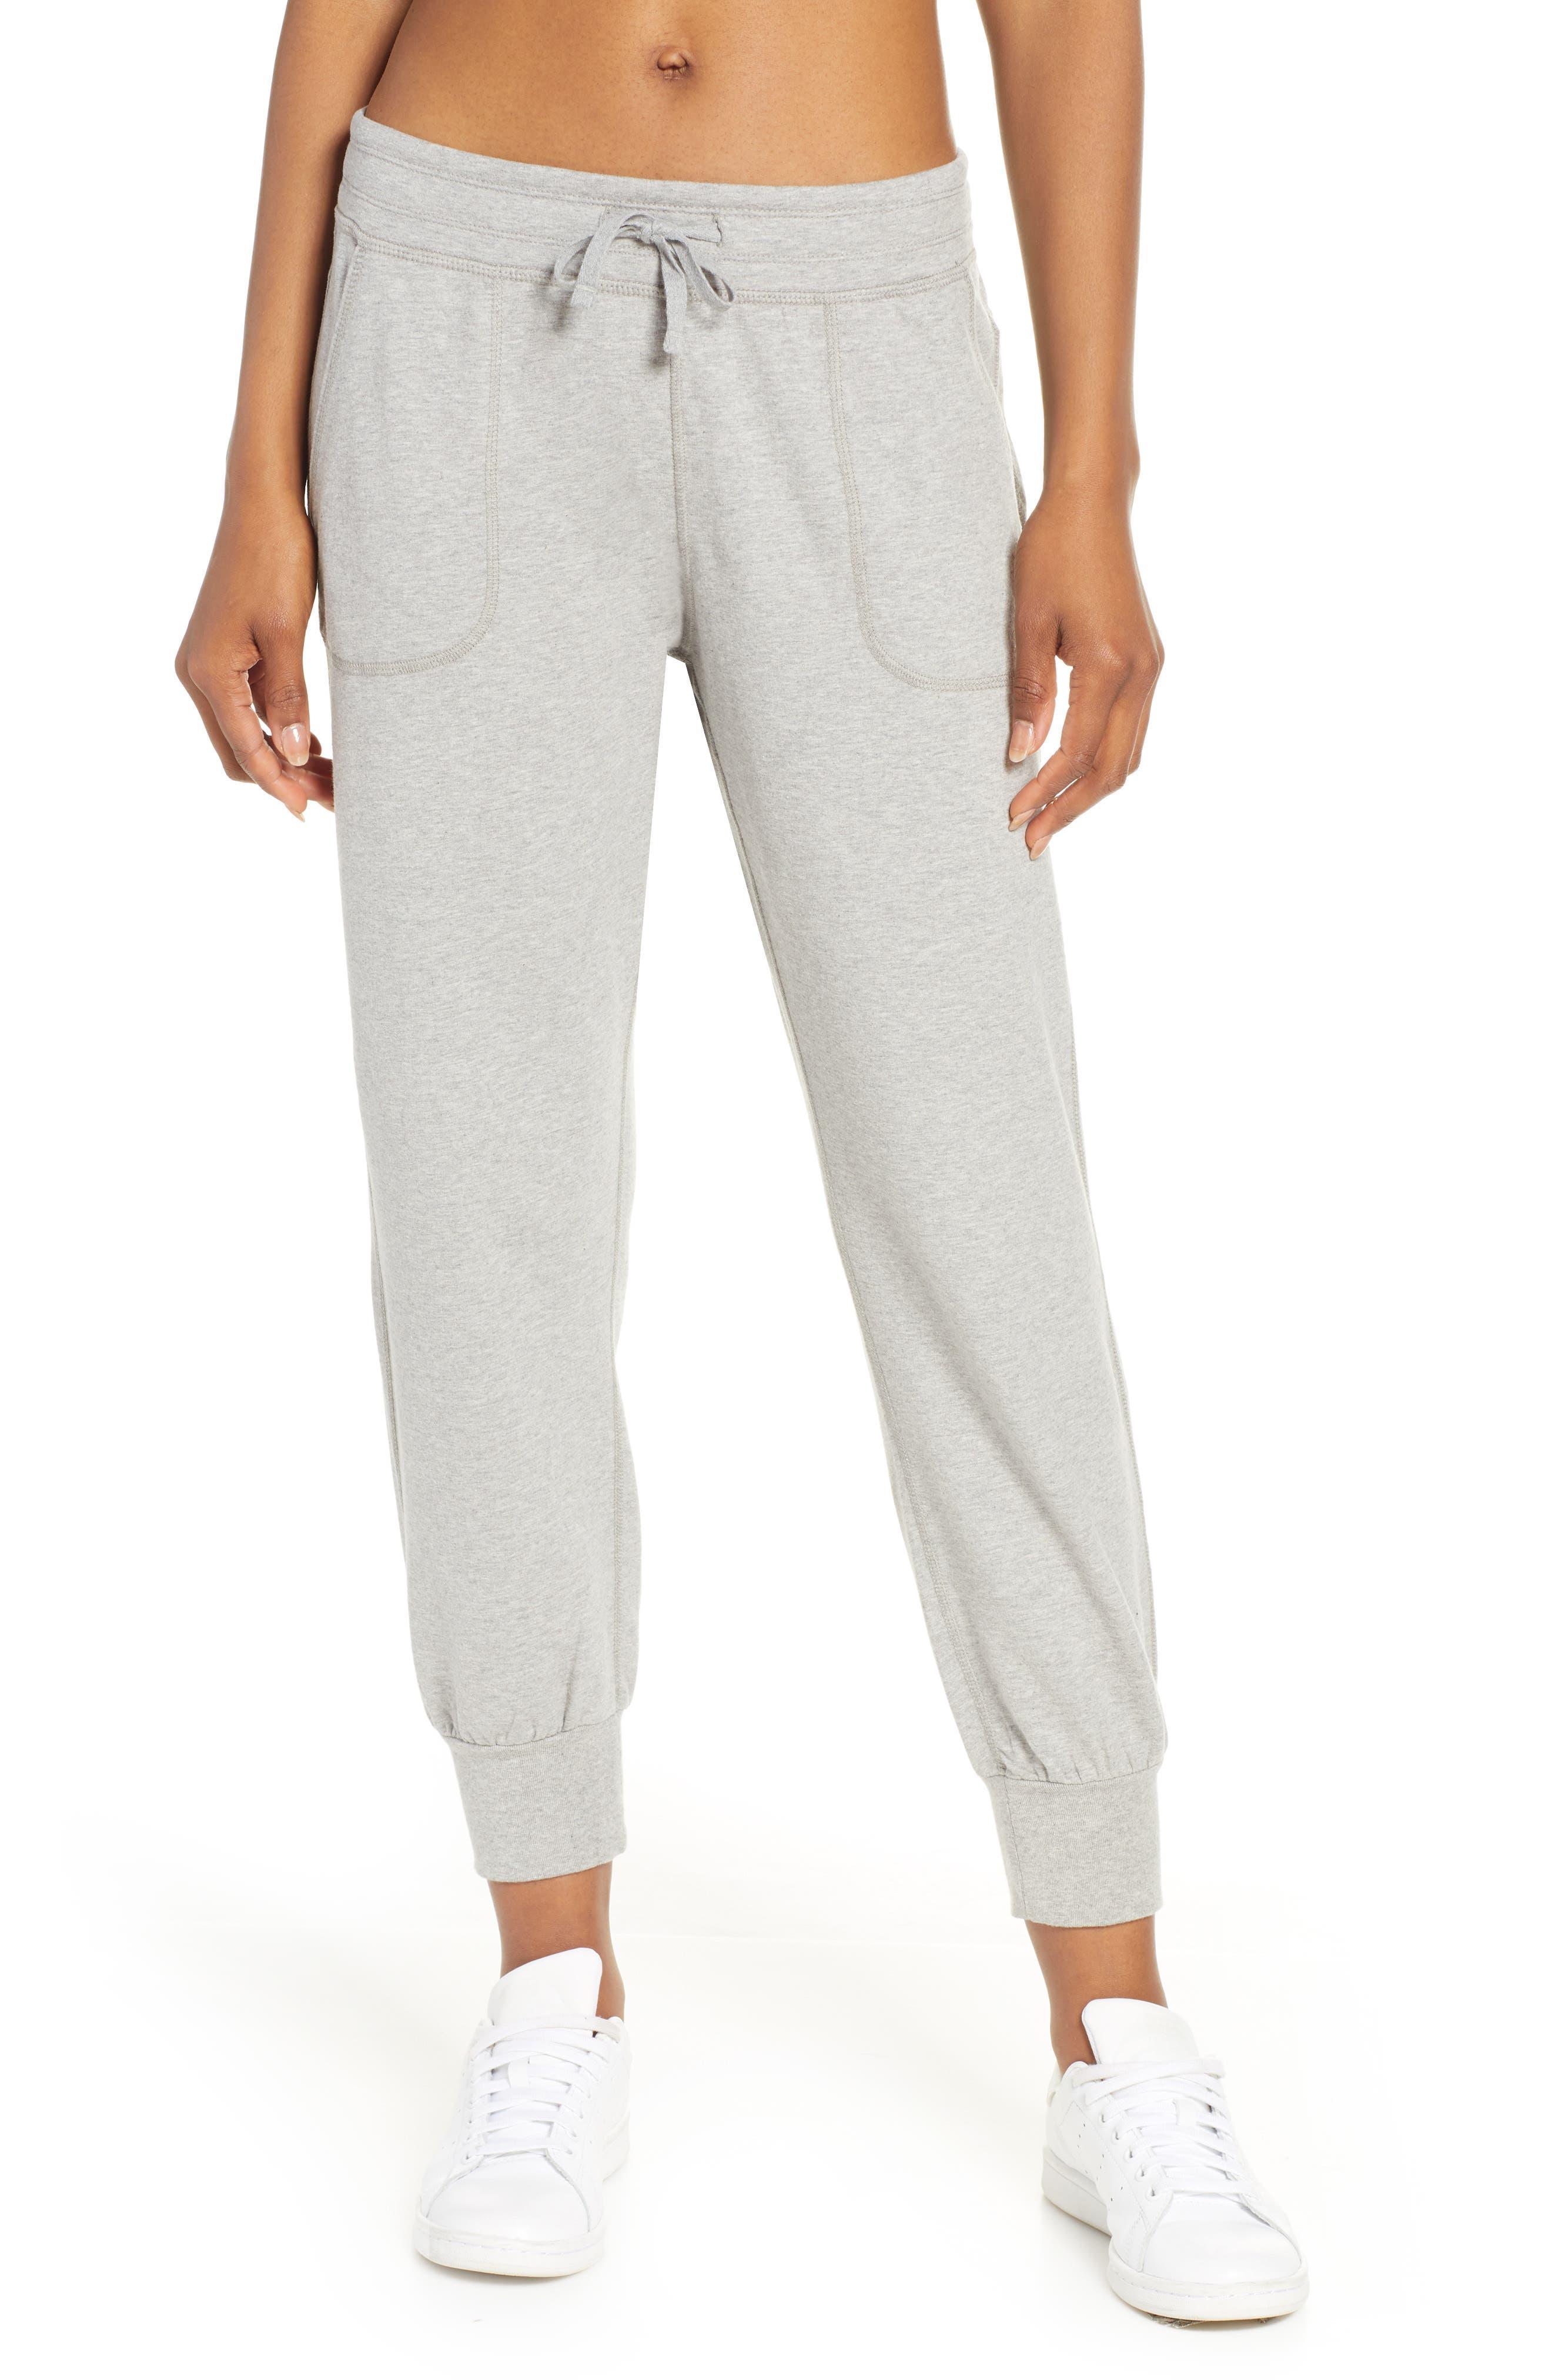 Patagonia Ahnya Fleece Pants, Grey